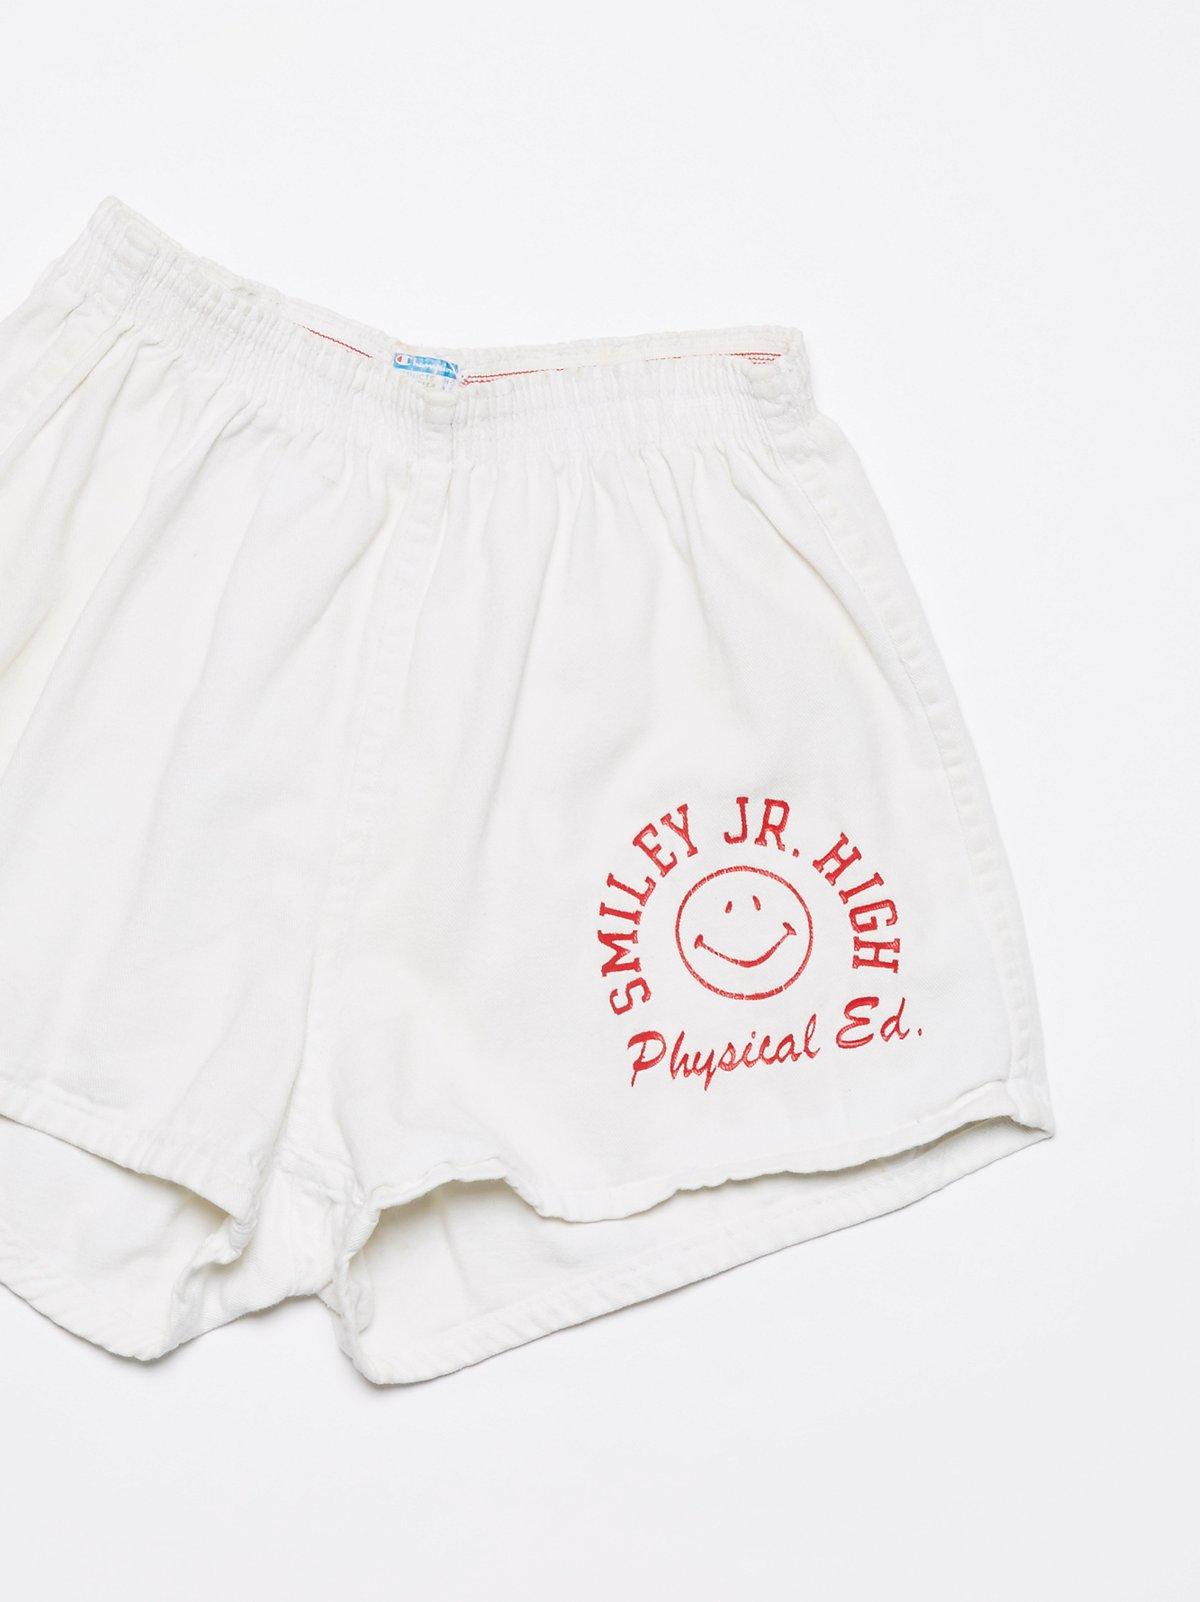 Vintage 1970s Gym Shorts